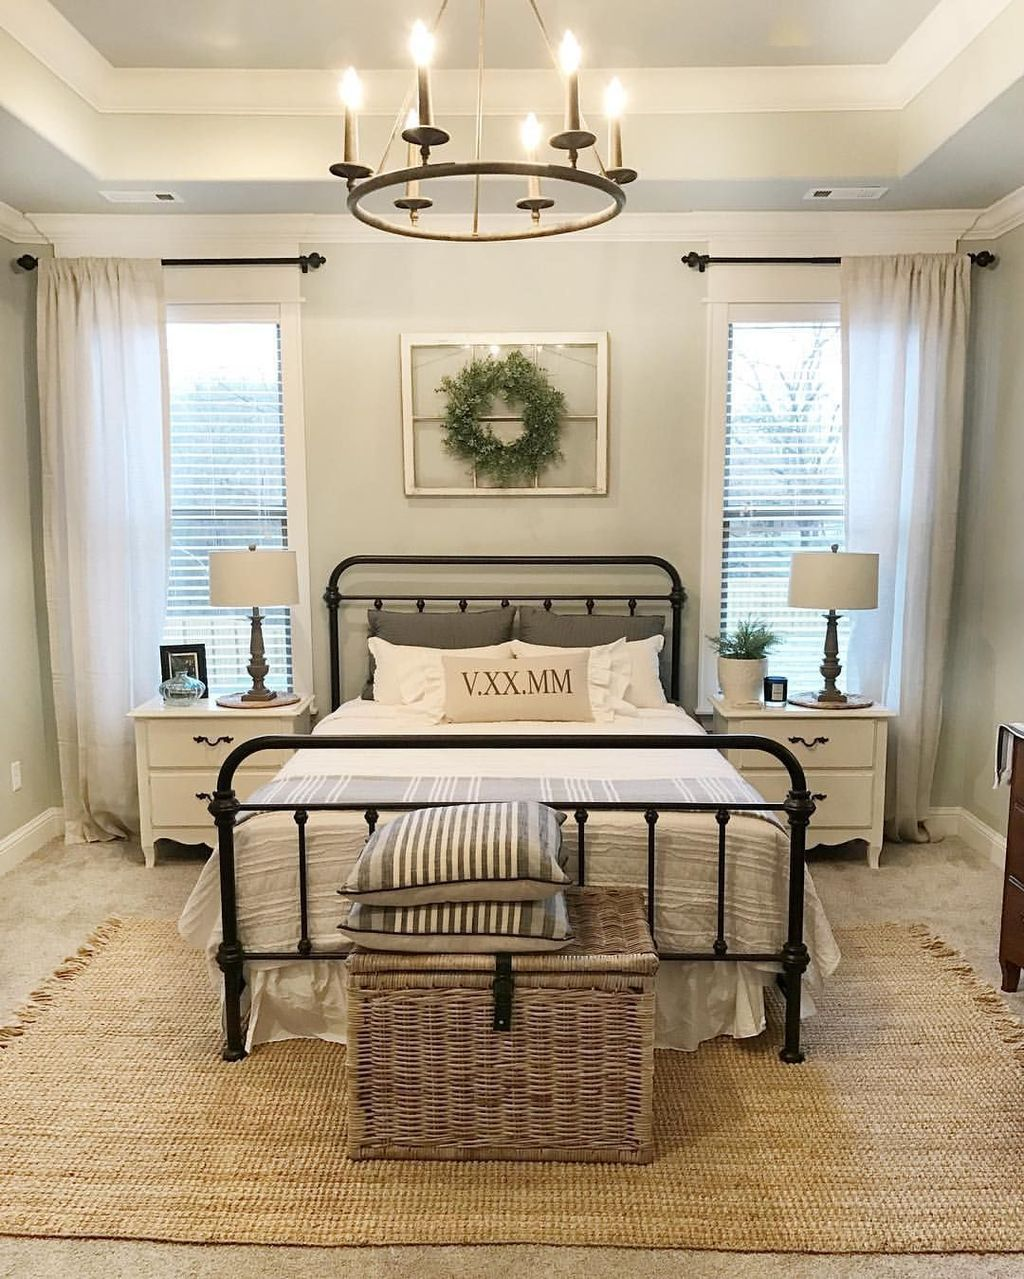 Bedroom window ideas   beautiful bedroom window ideas  pinterest  bedroom windows